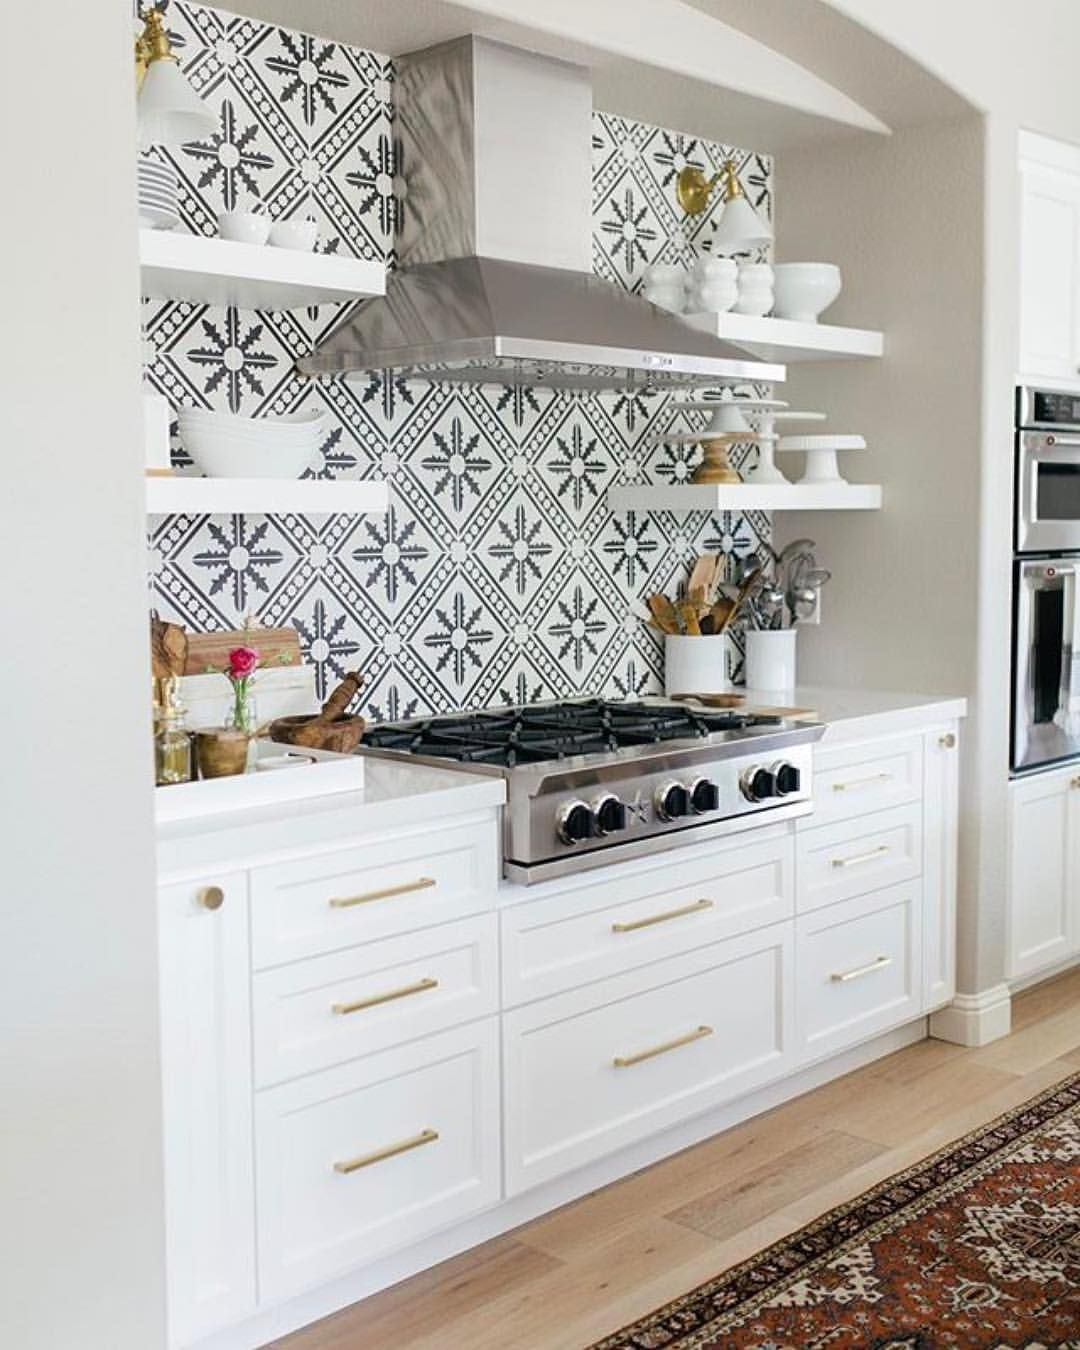 37 Amazing Kitchen Tile Backsplash with Brass